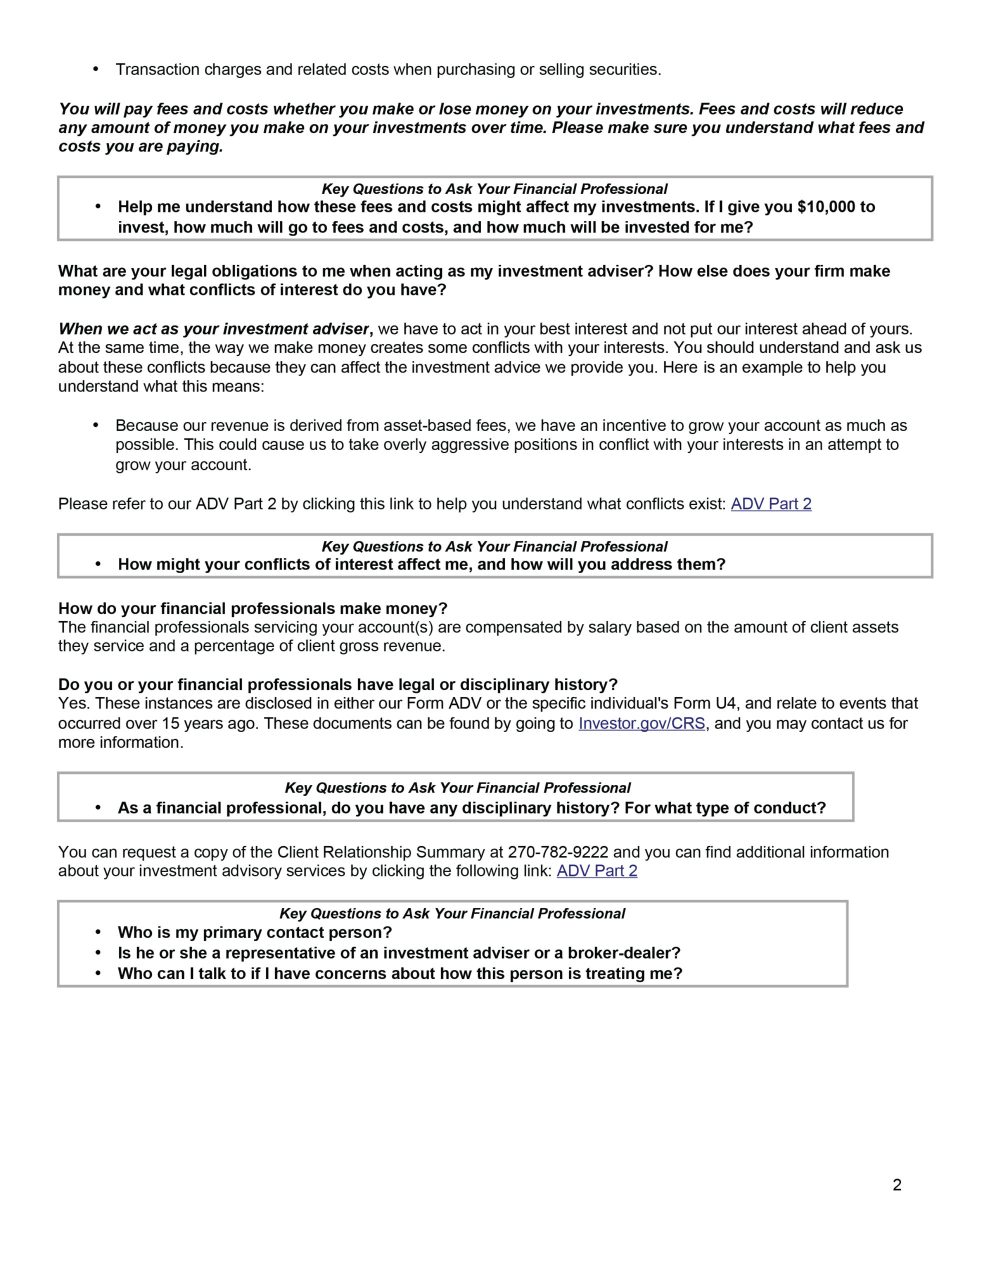 Form CRS page 2 Landmark Financial Advisors